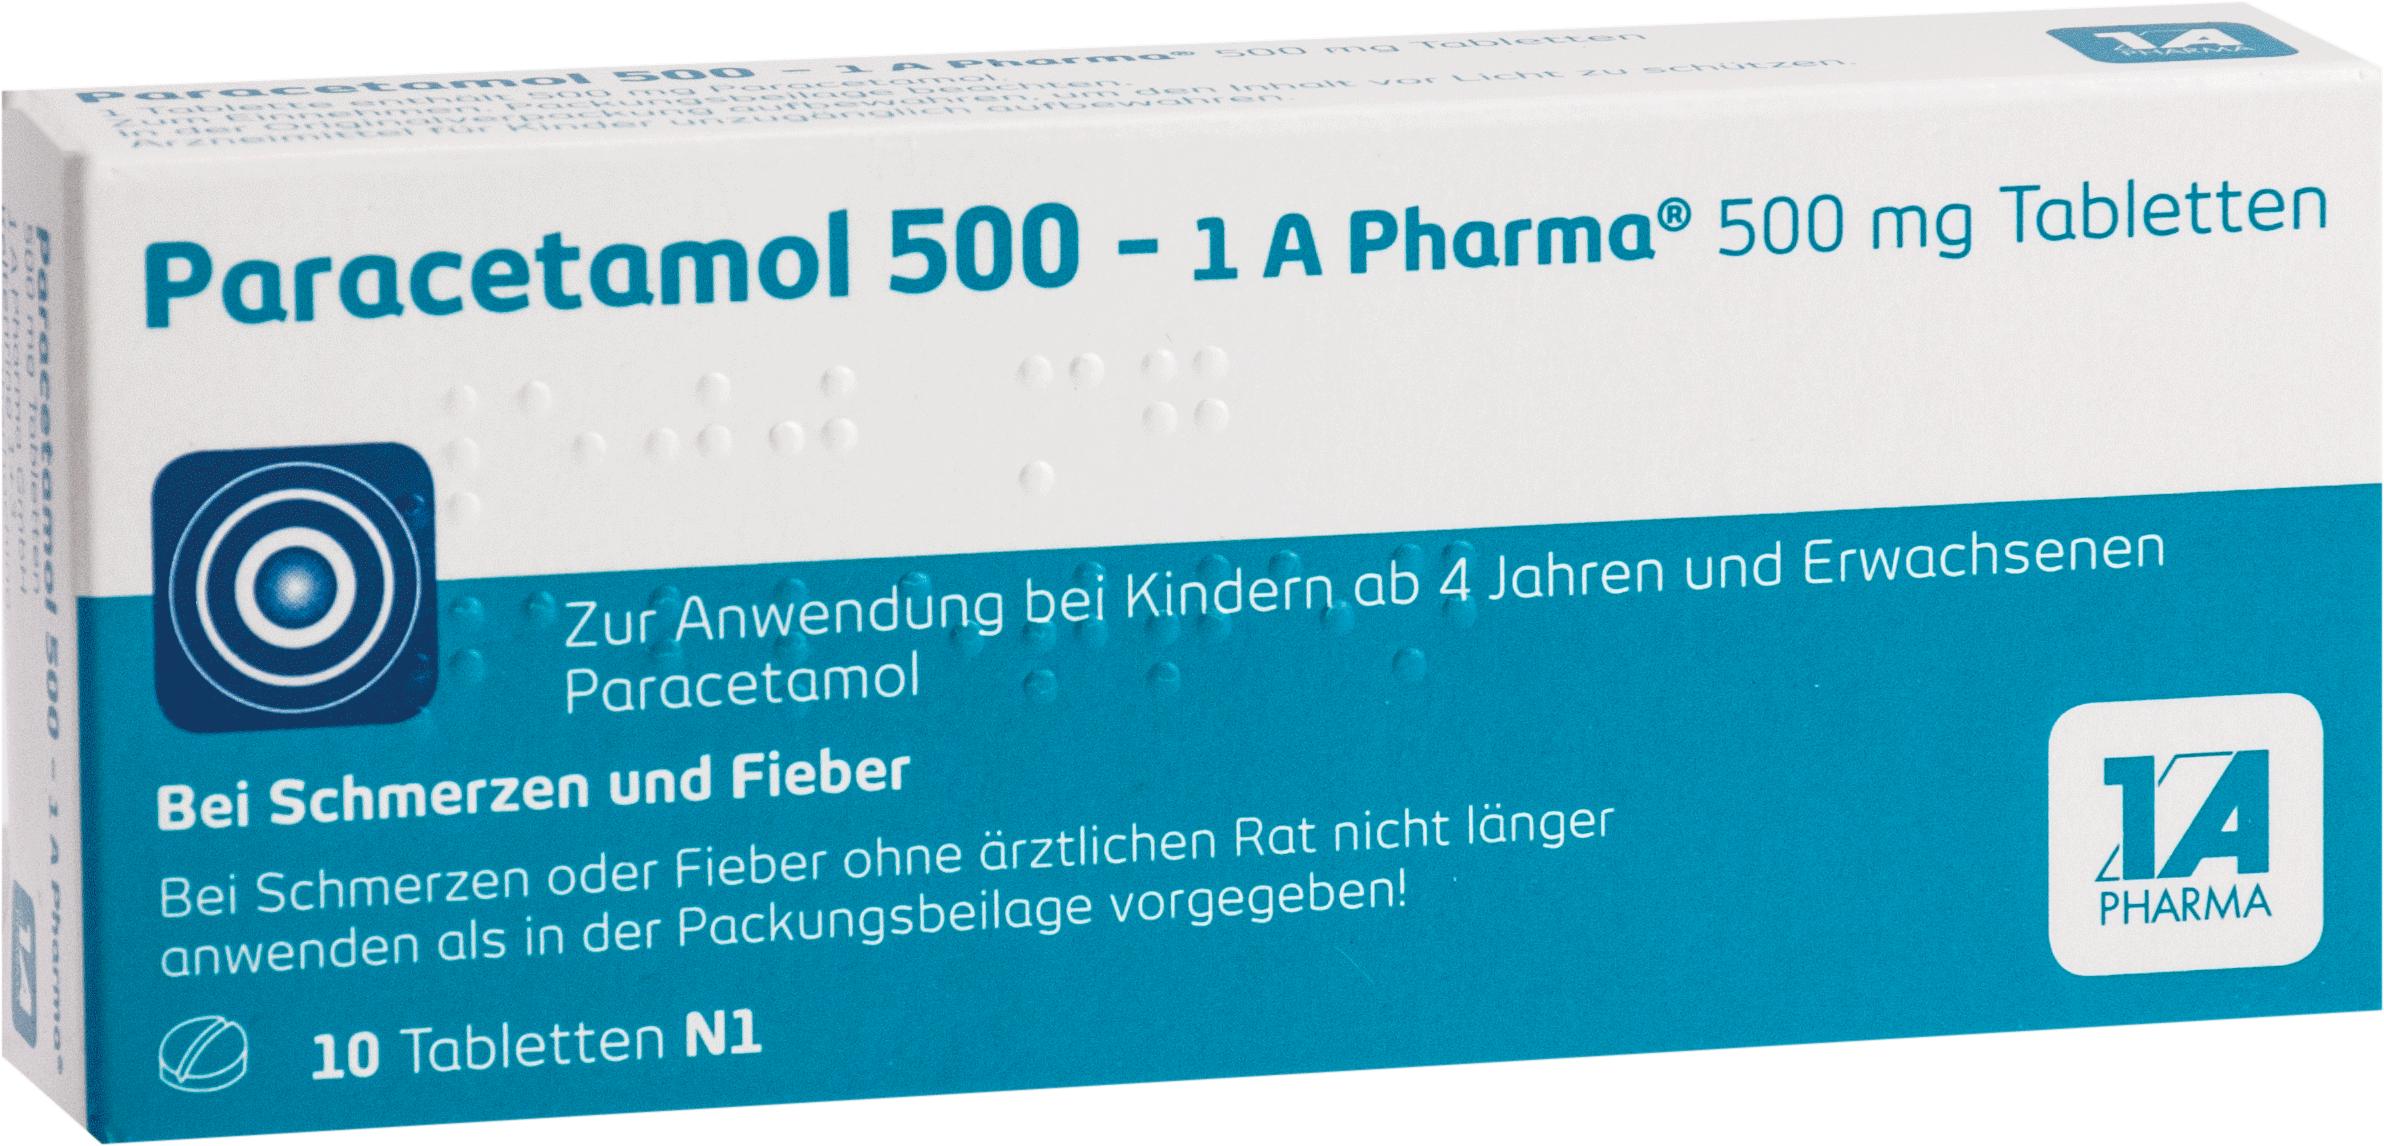 Paracetamol 500 - 1 A Pharma